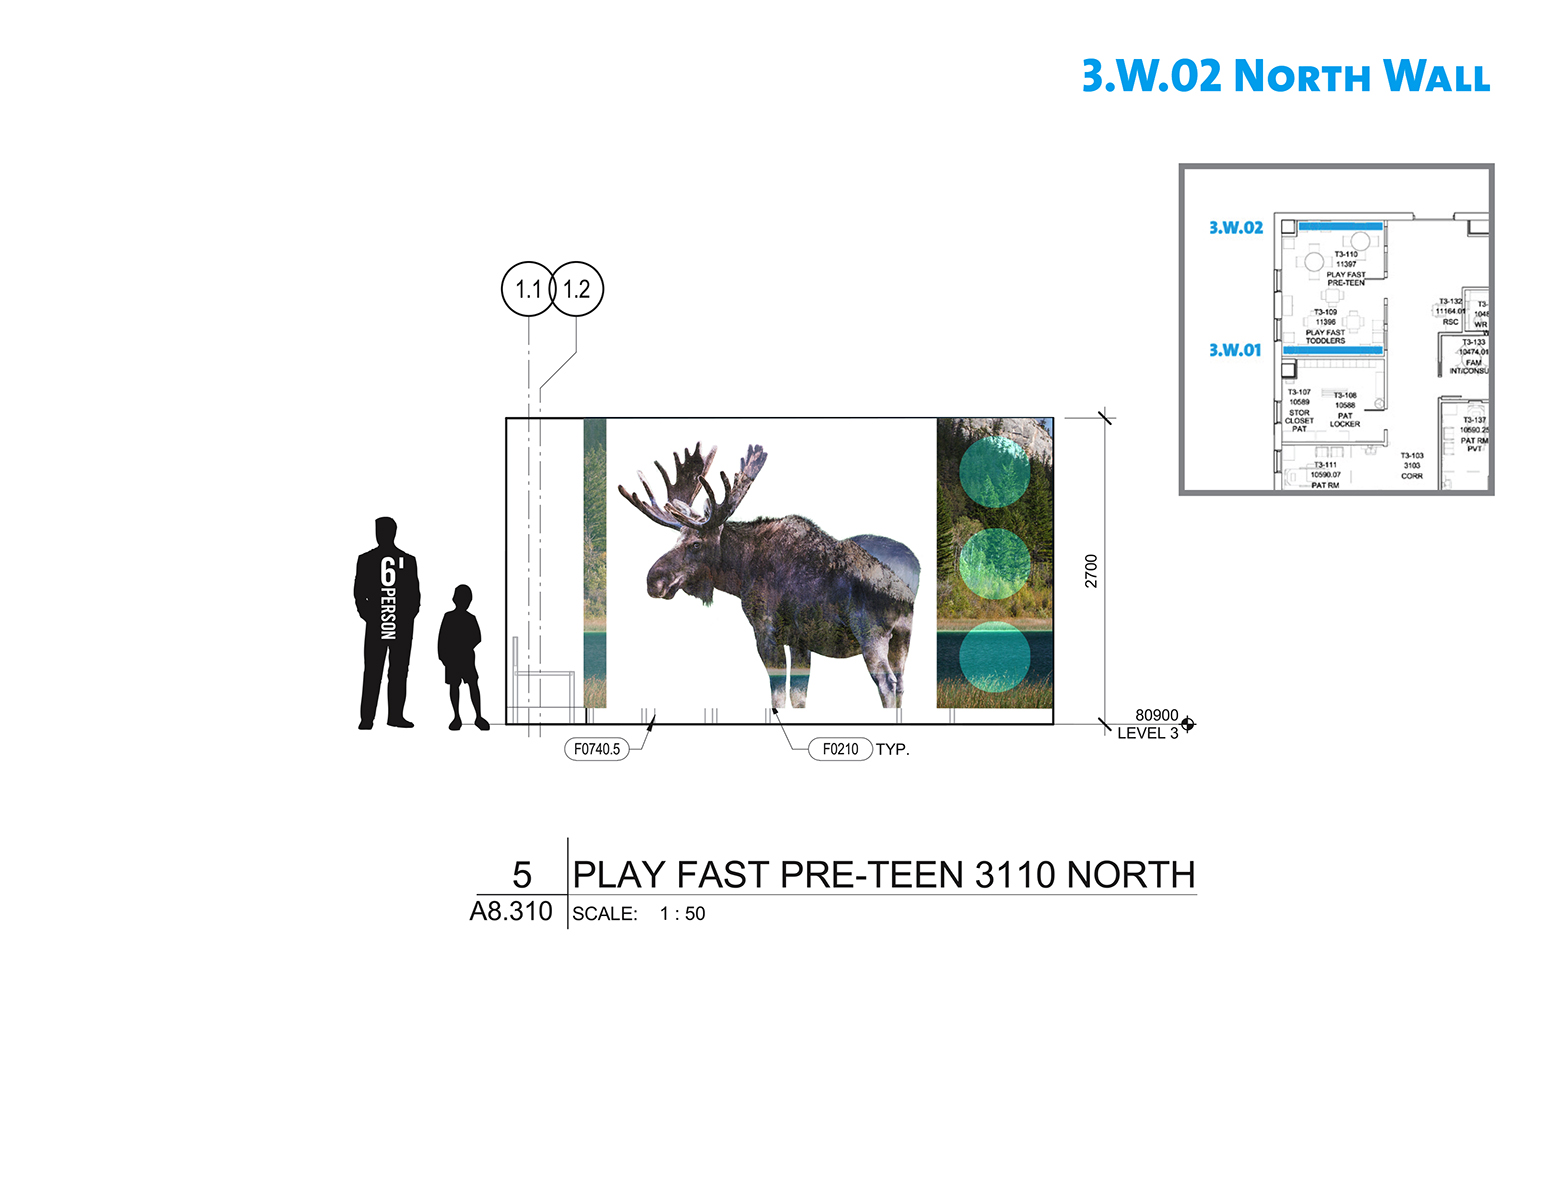 03_3.W.02 FASTING TEEN elevations- Moose_White_Circle.jpg